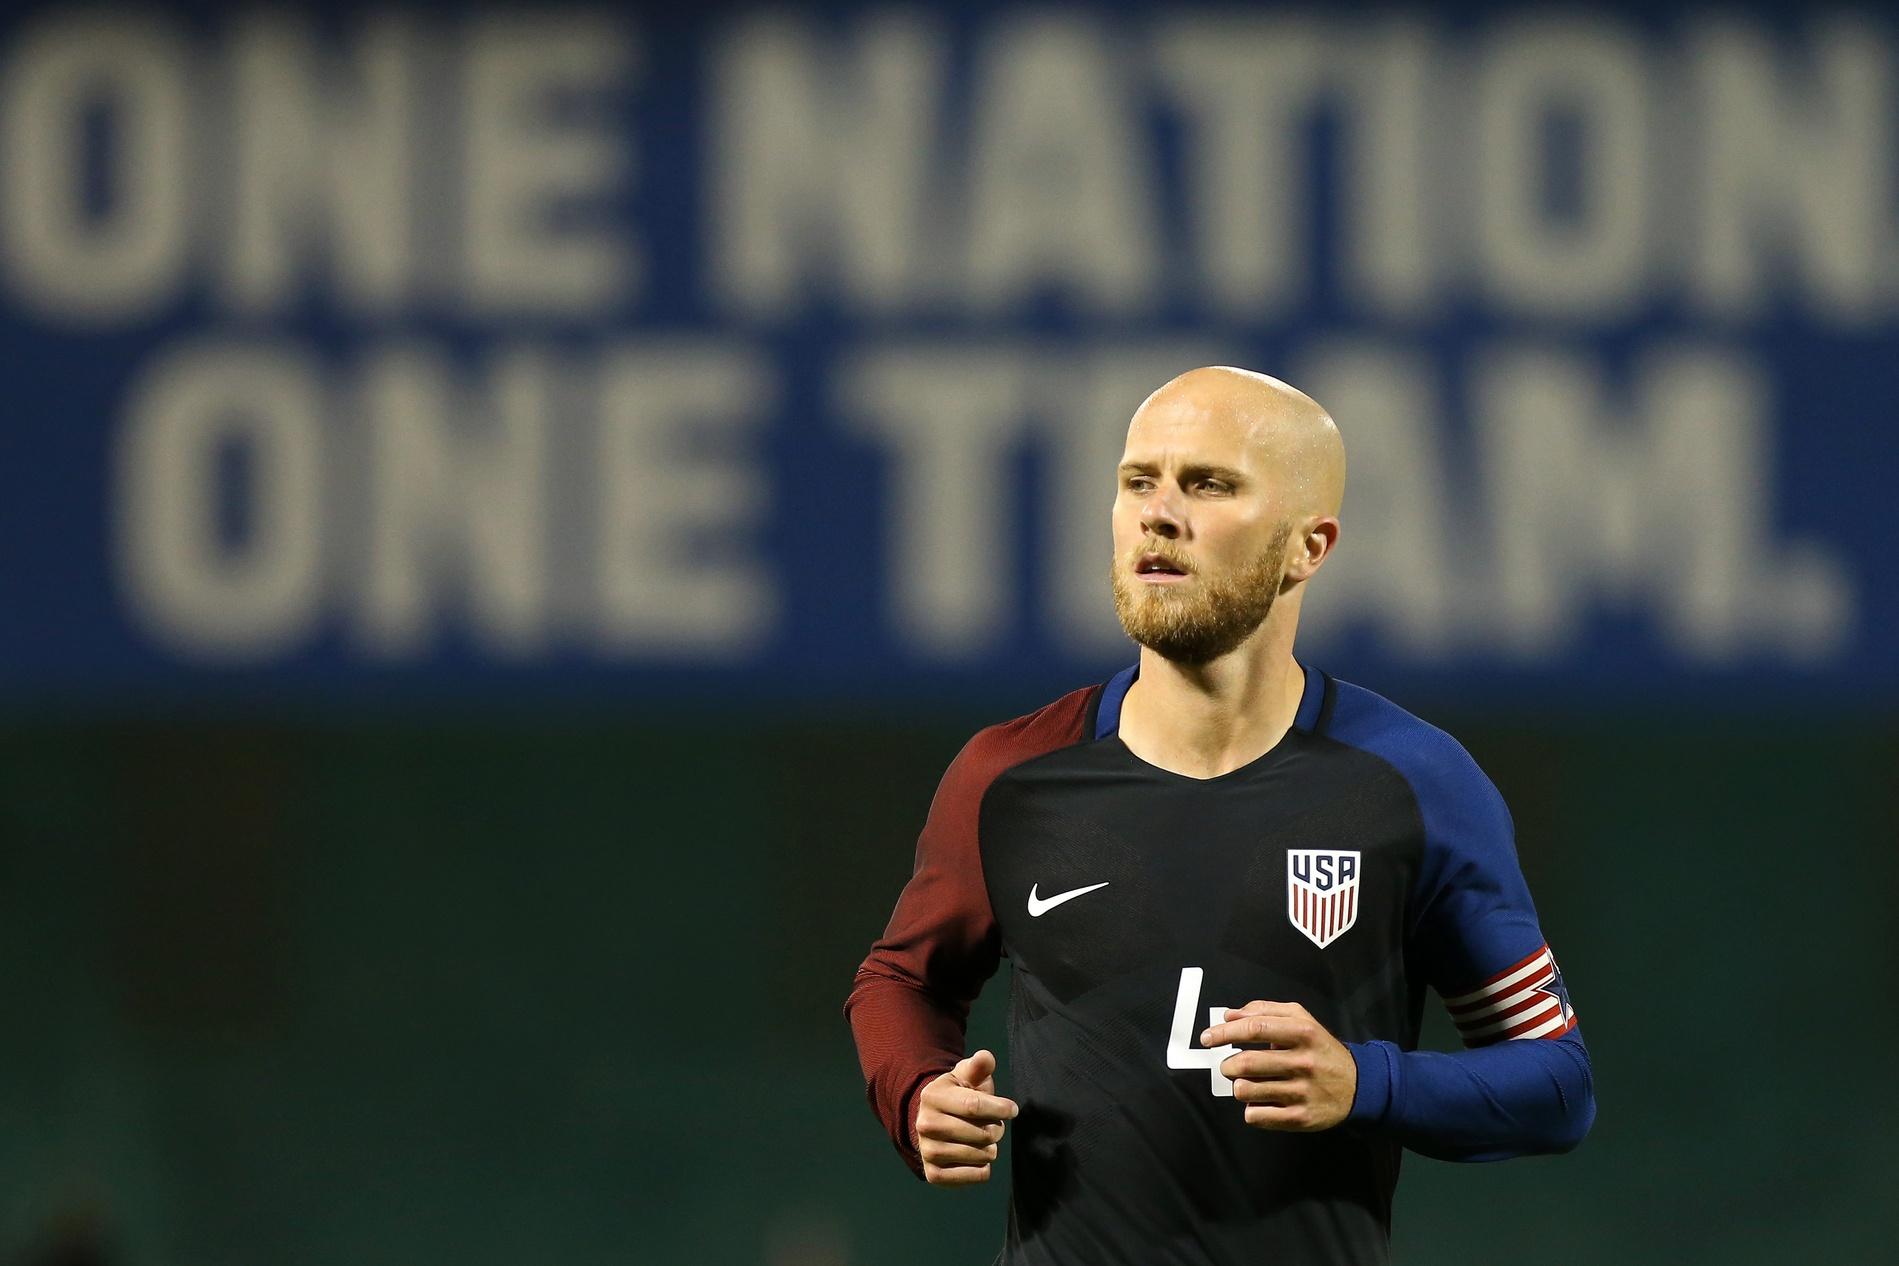 Photo by Geoff Burke/USA TODAY Sports